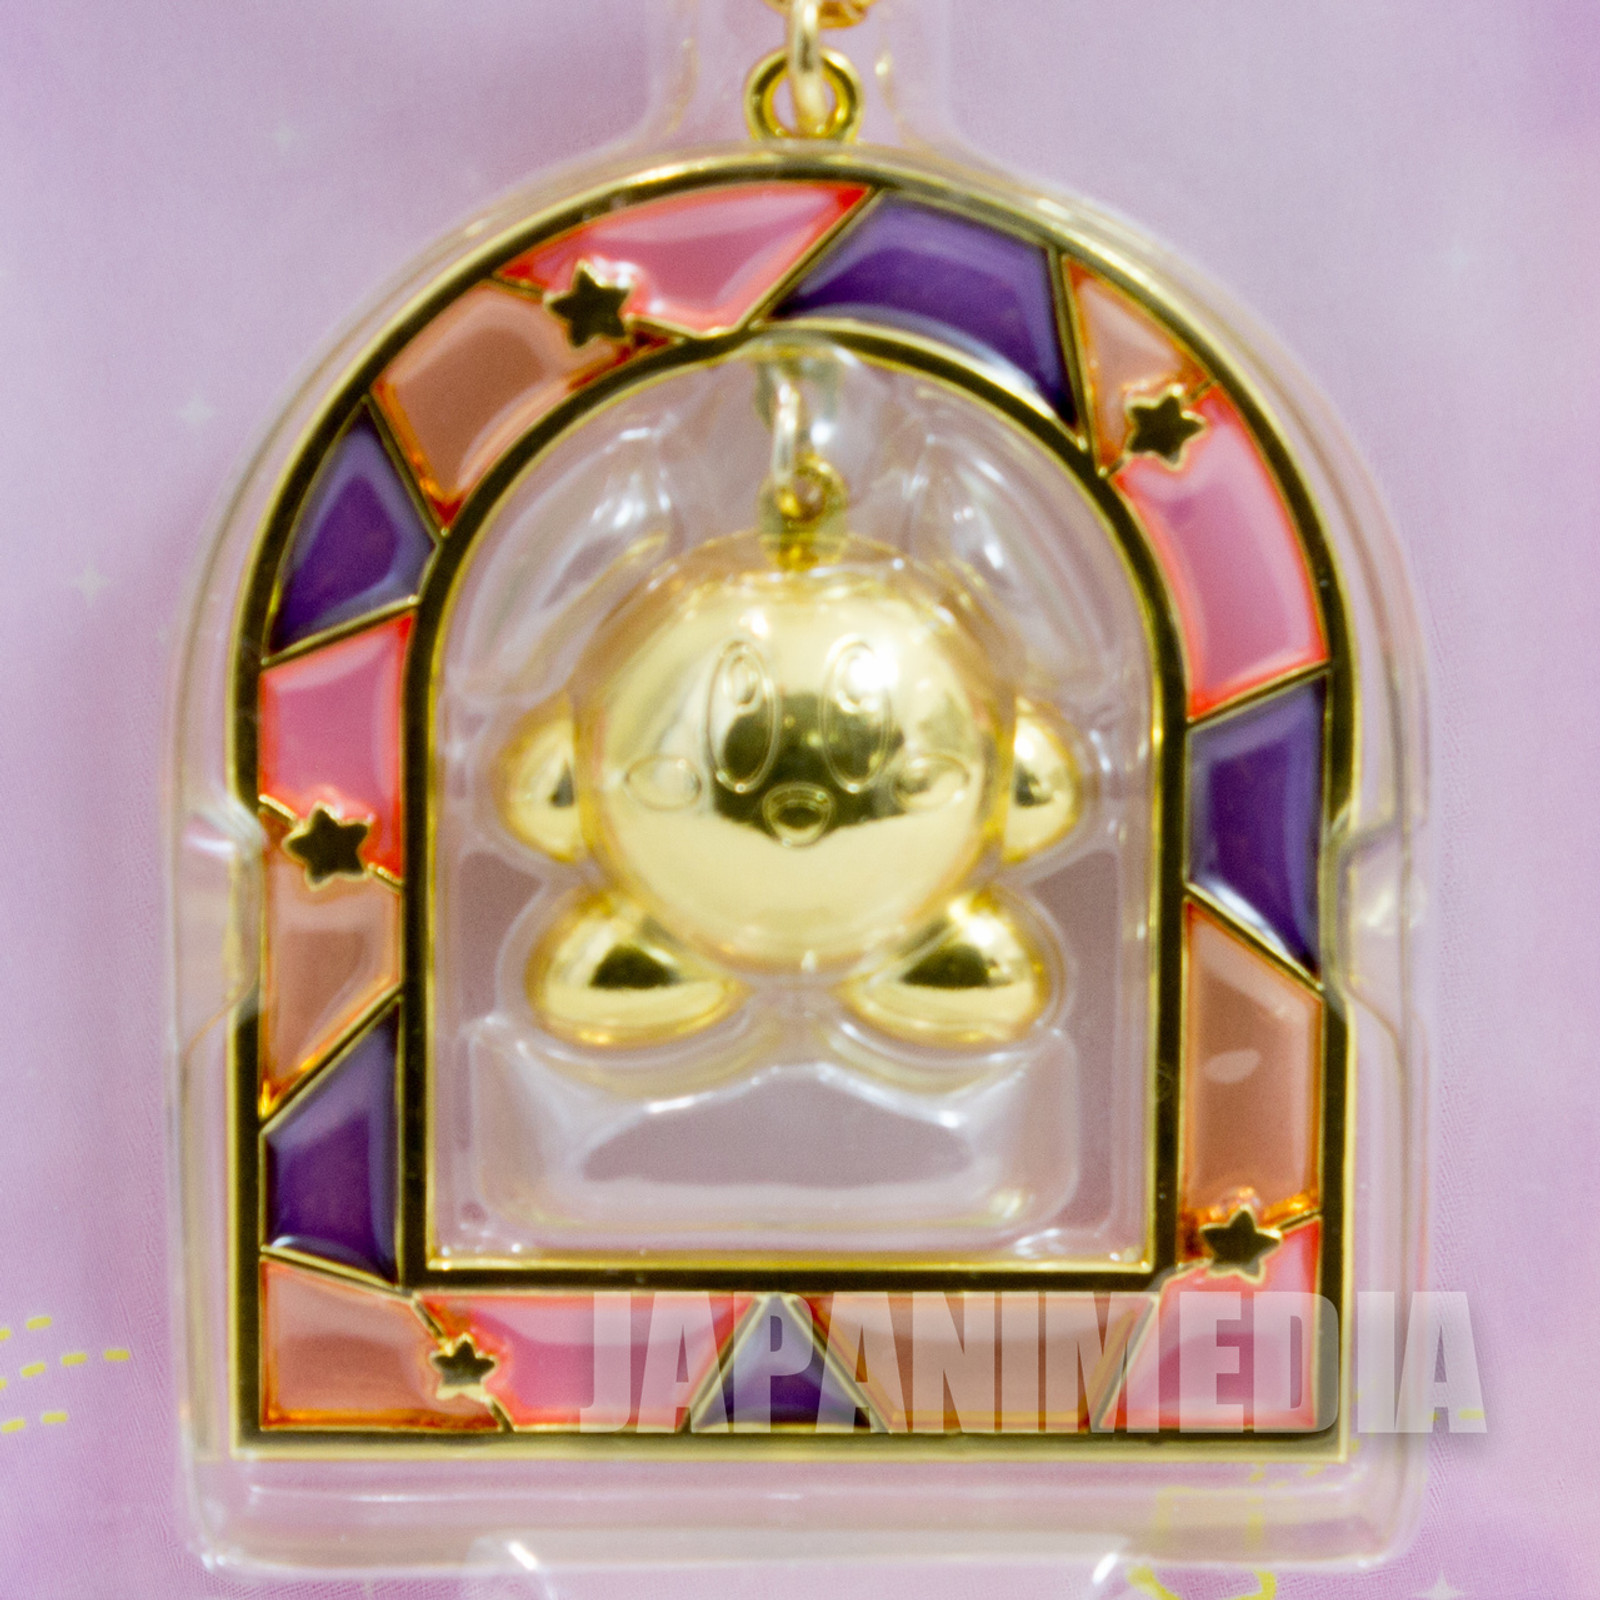 Kirby Super Star Twinkle Night Mascot Charm Keychain Banpresto JAPAN 1